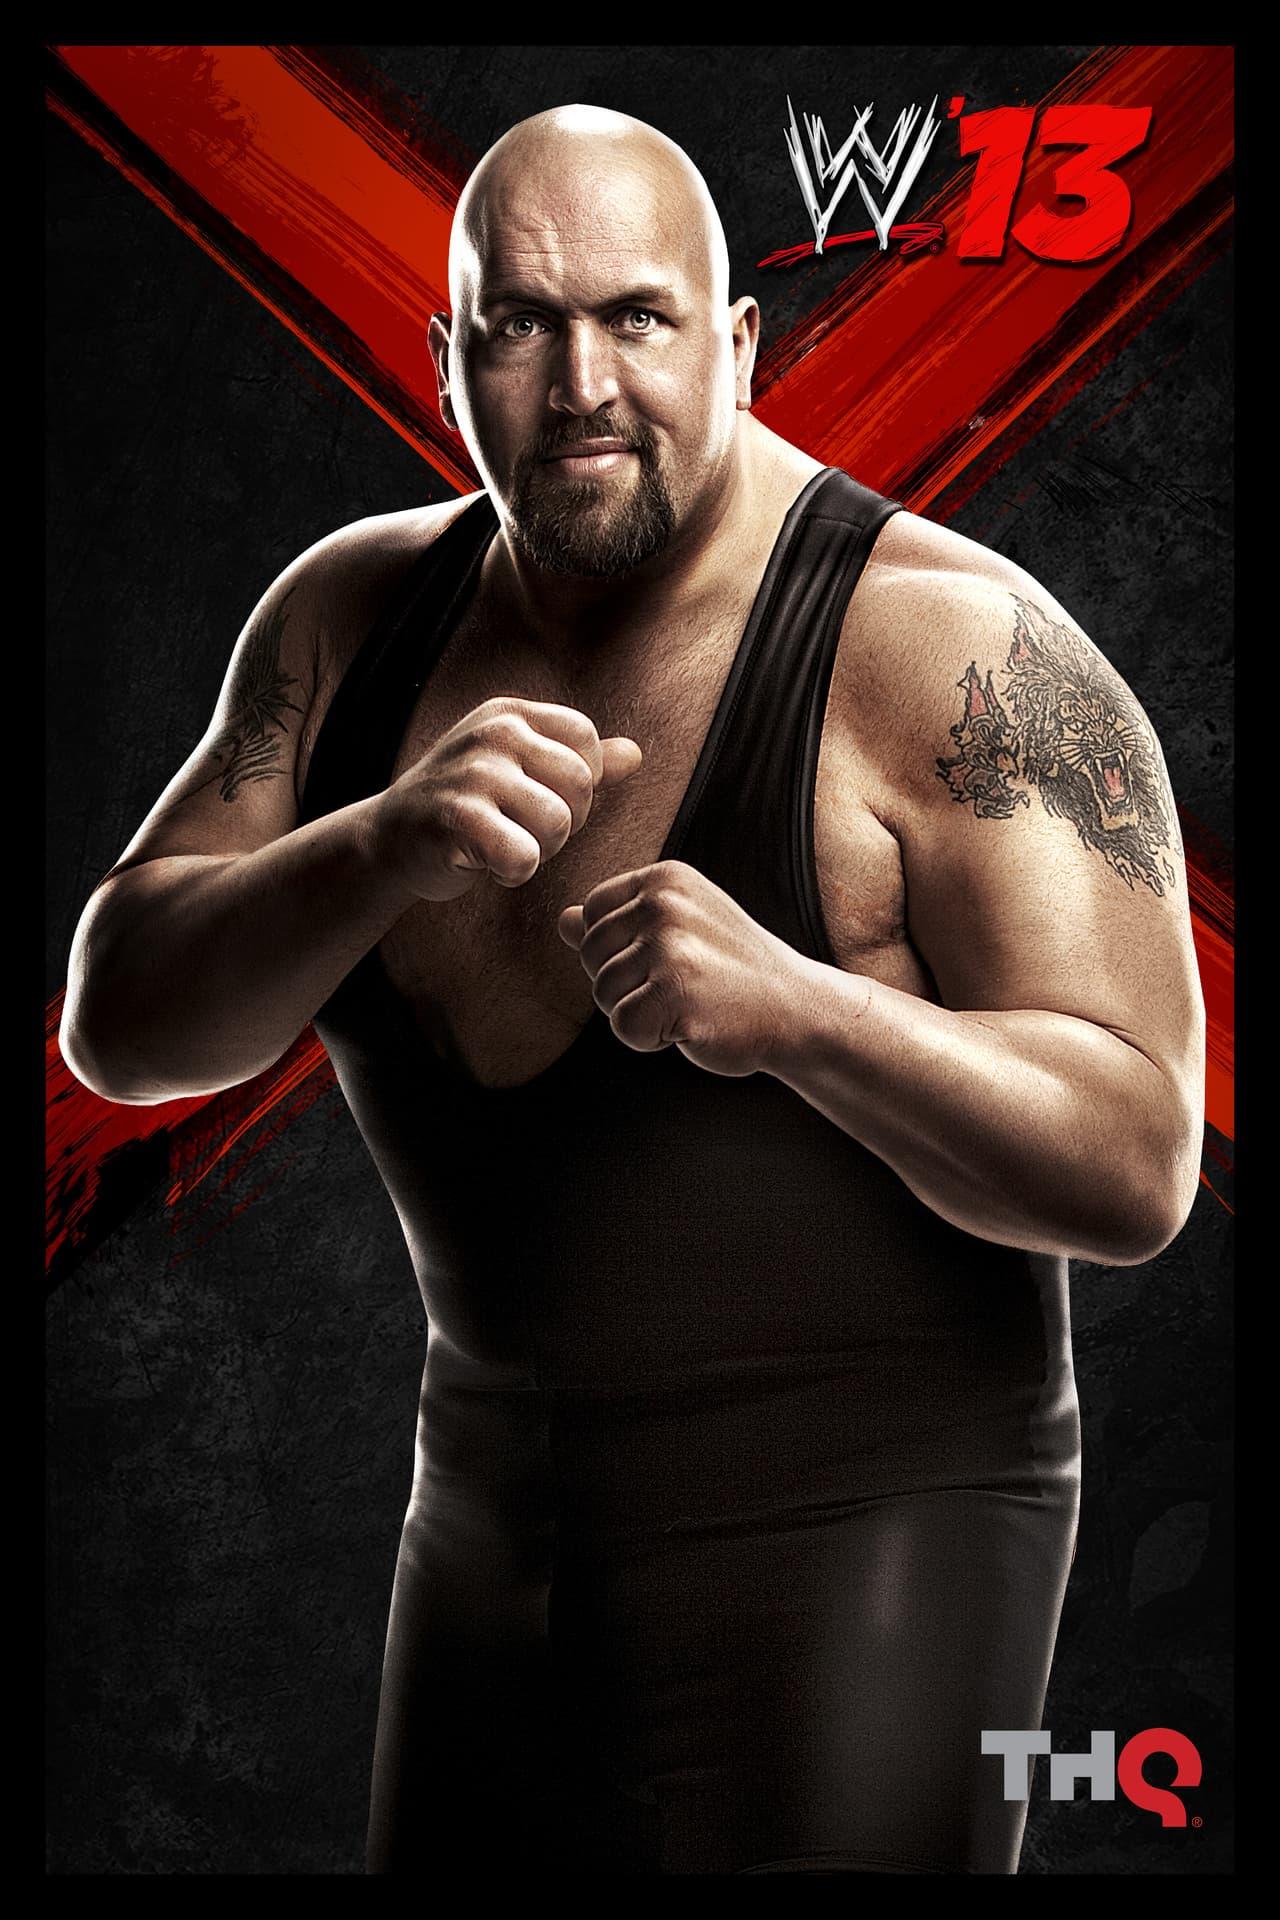 WWE'13 Xbox 360